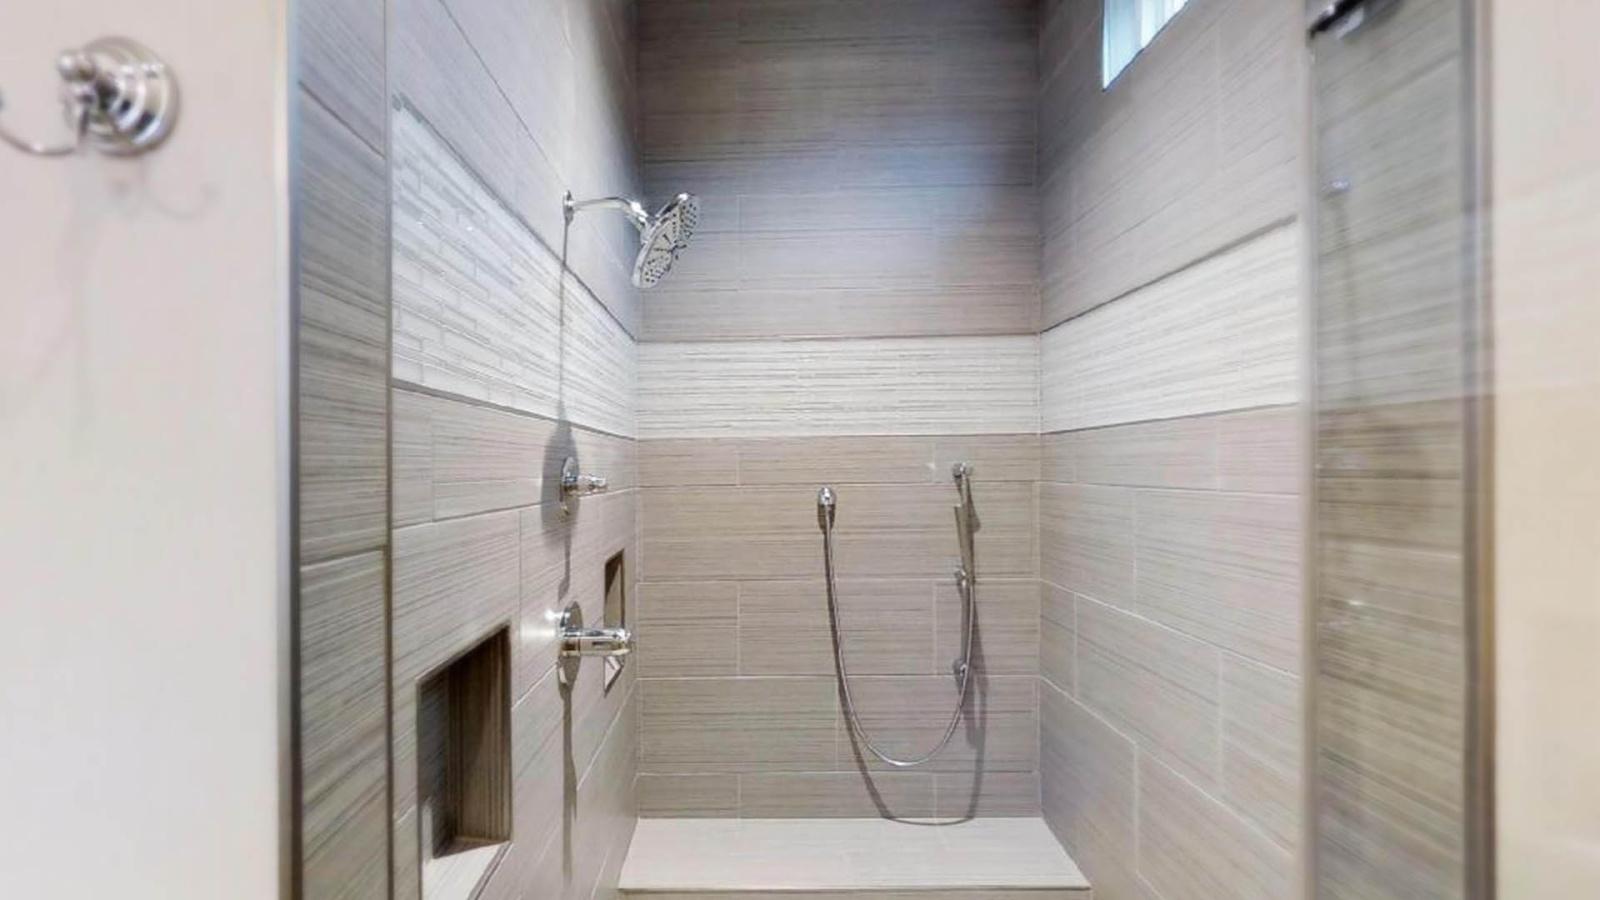 4 Bedrooms Bedrooms, ,4 BathroomsBathrooms,Custom Home,Home Plans,1031